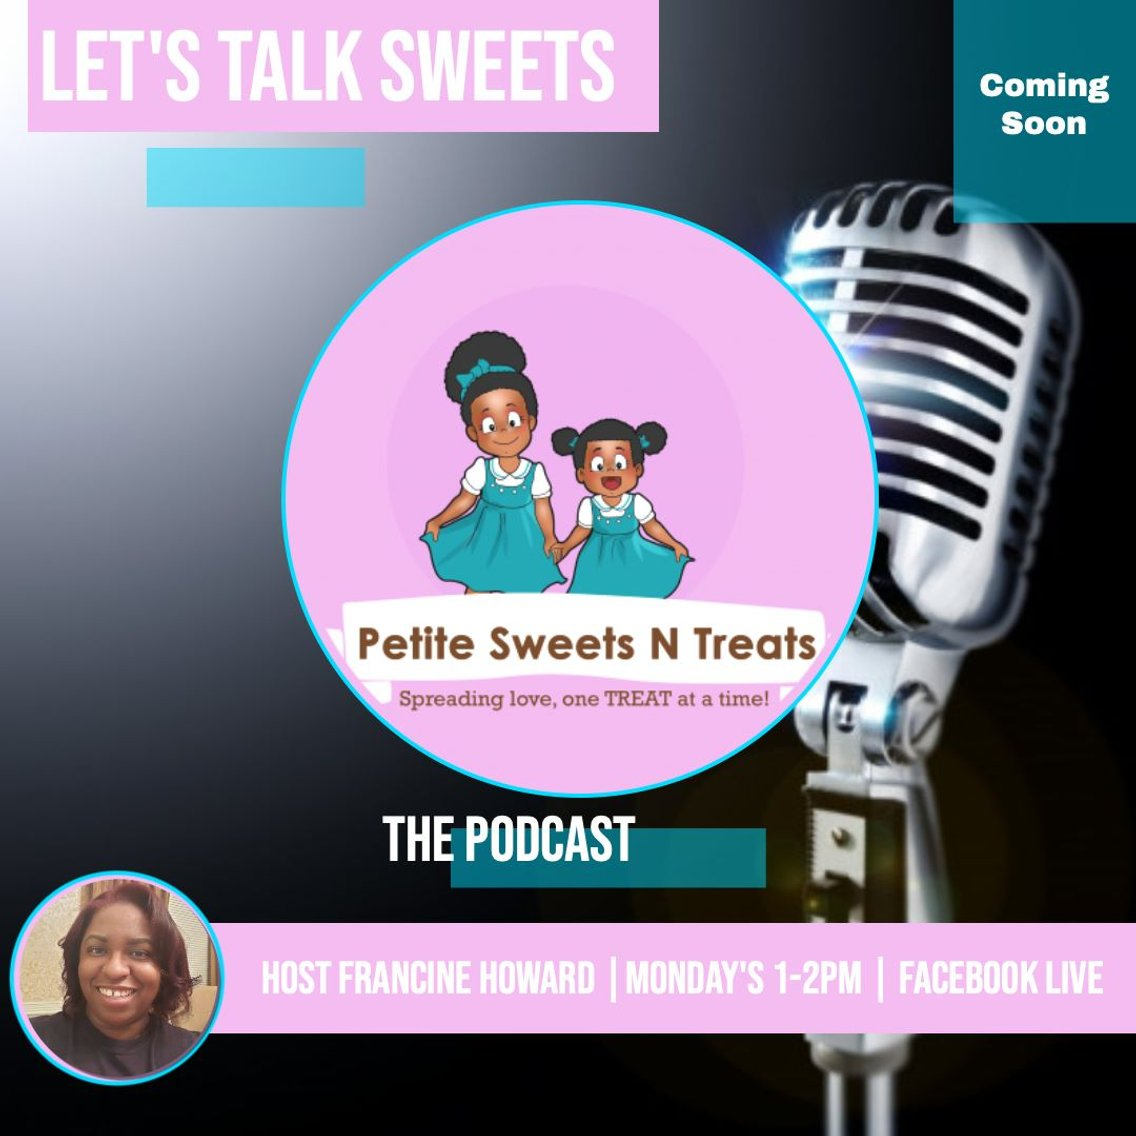 Petite Sweets N Treats Podcast - immagine di copertina